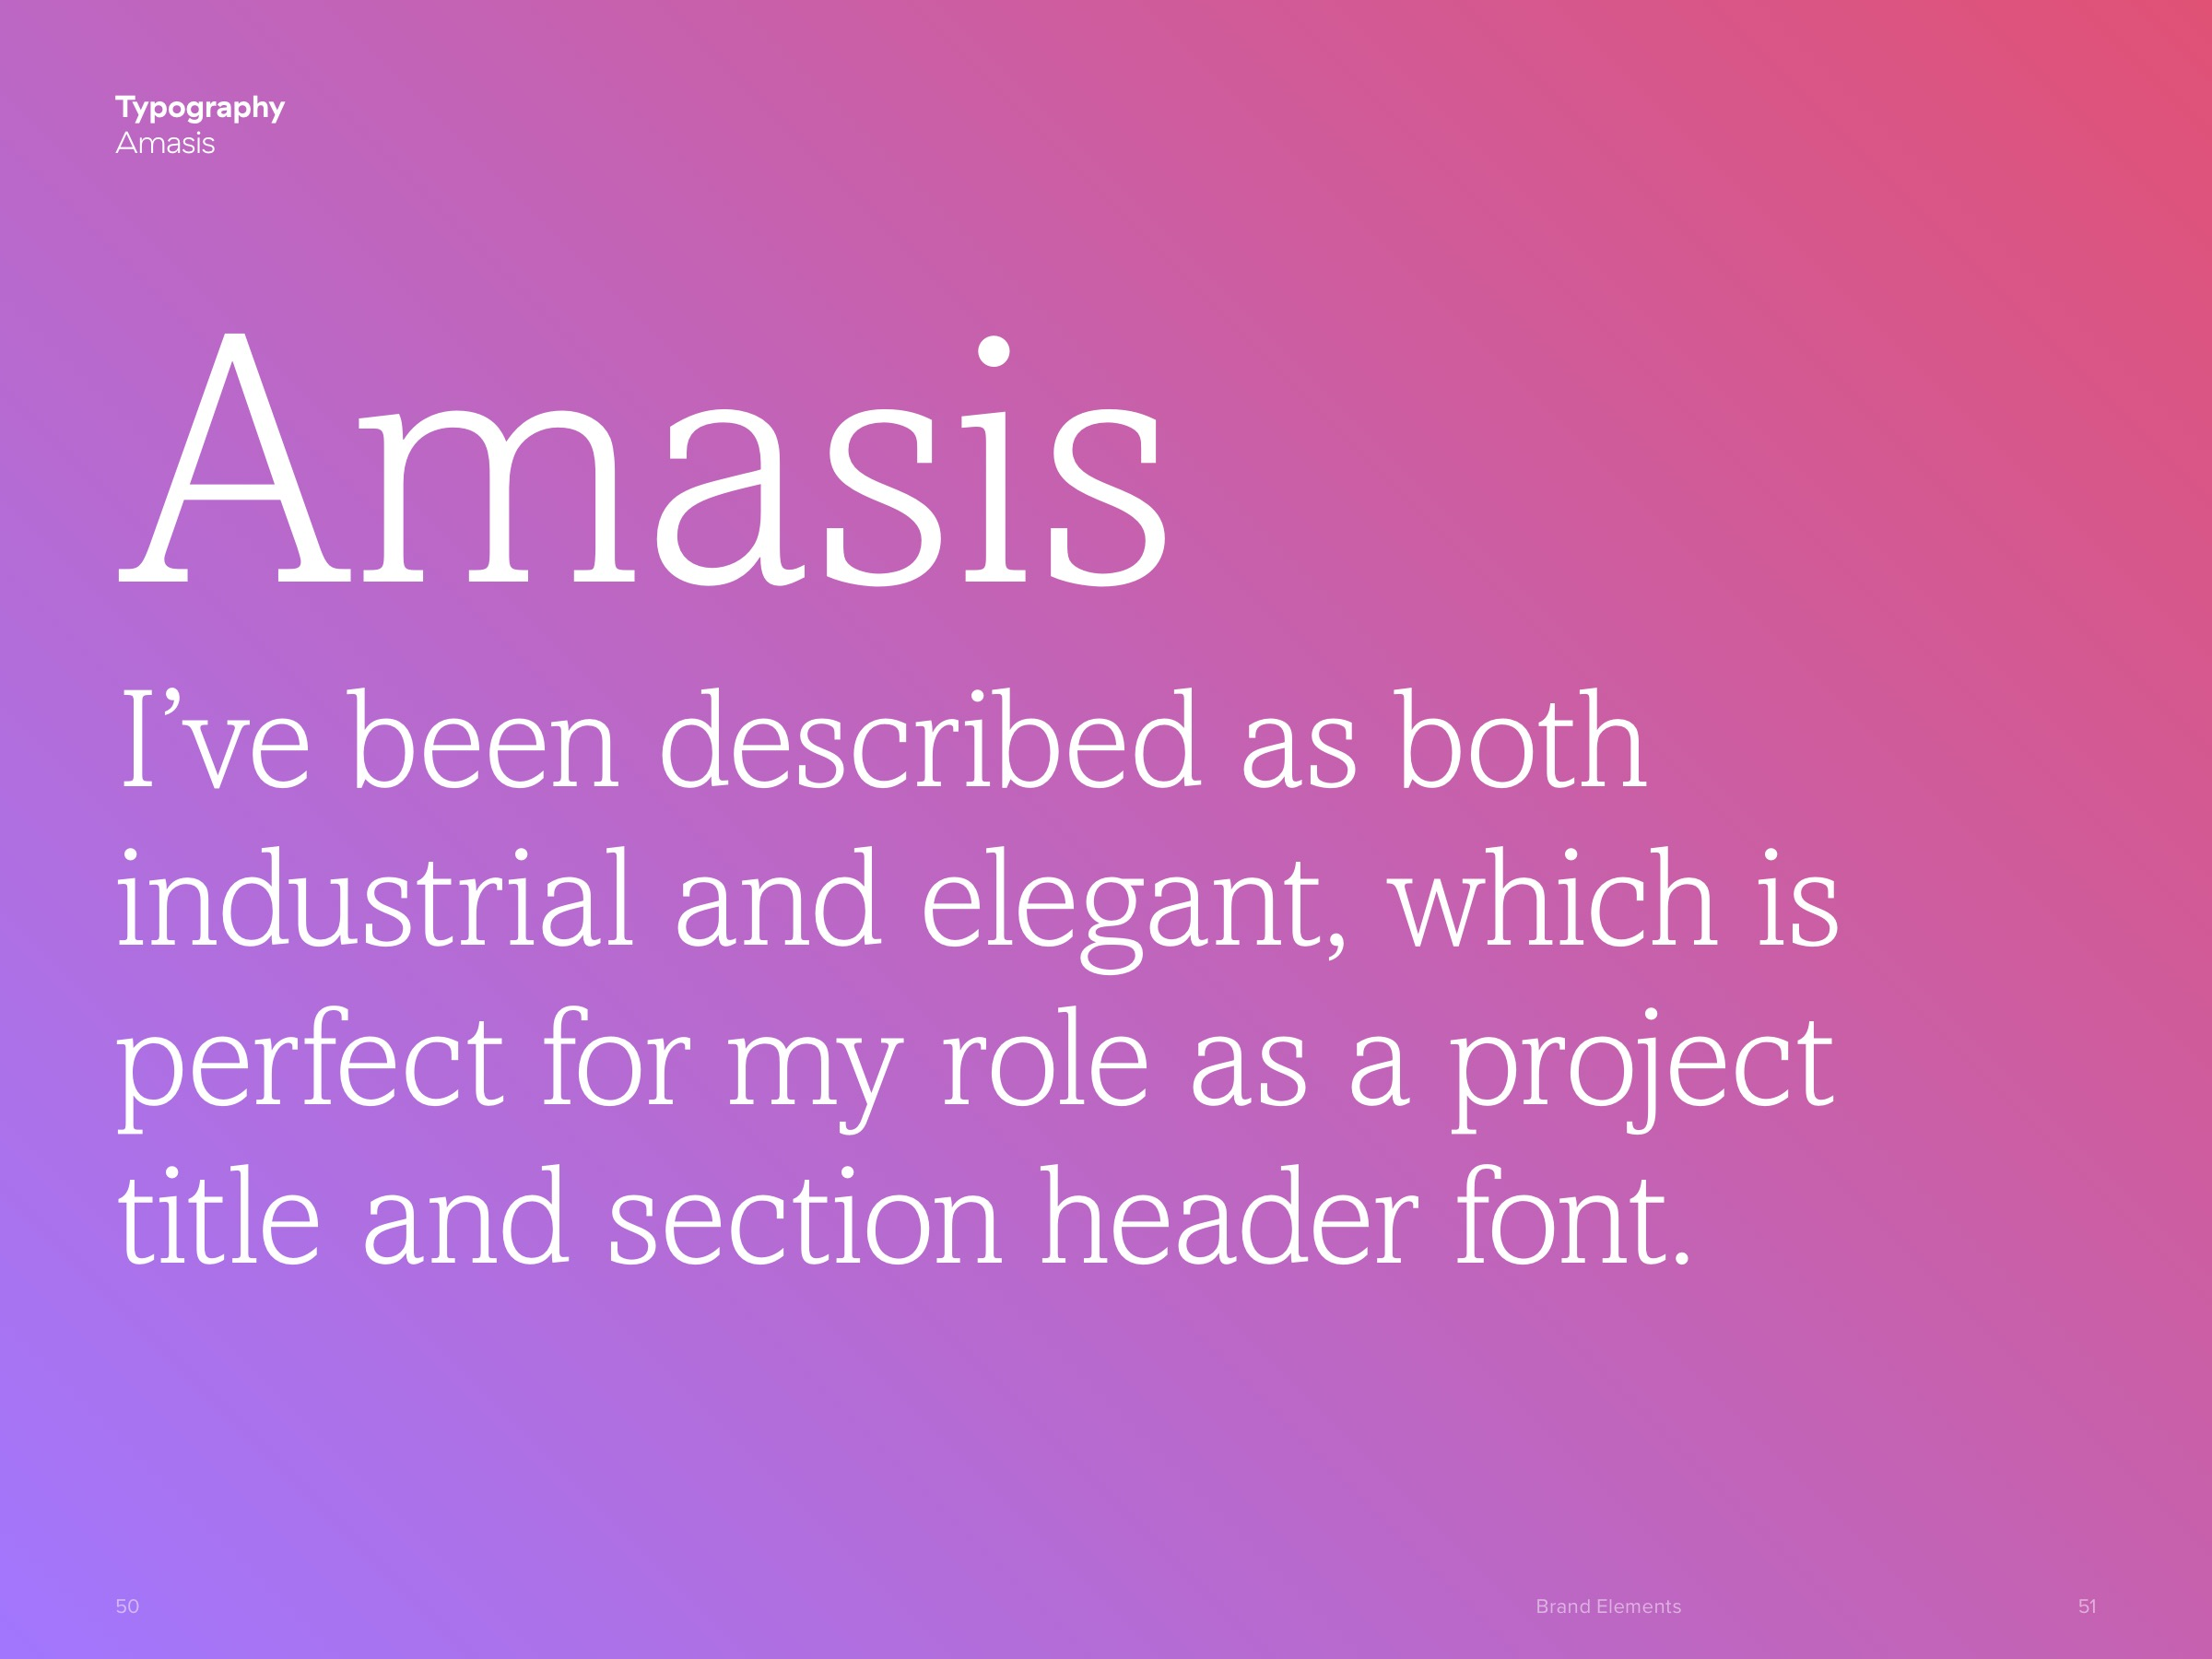 Asana-Brandbook-v1b 66.jpeg